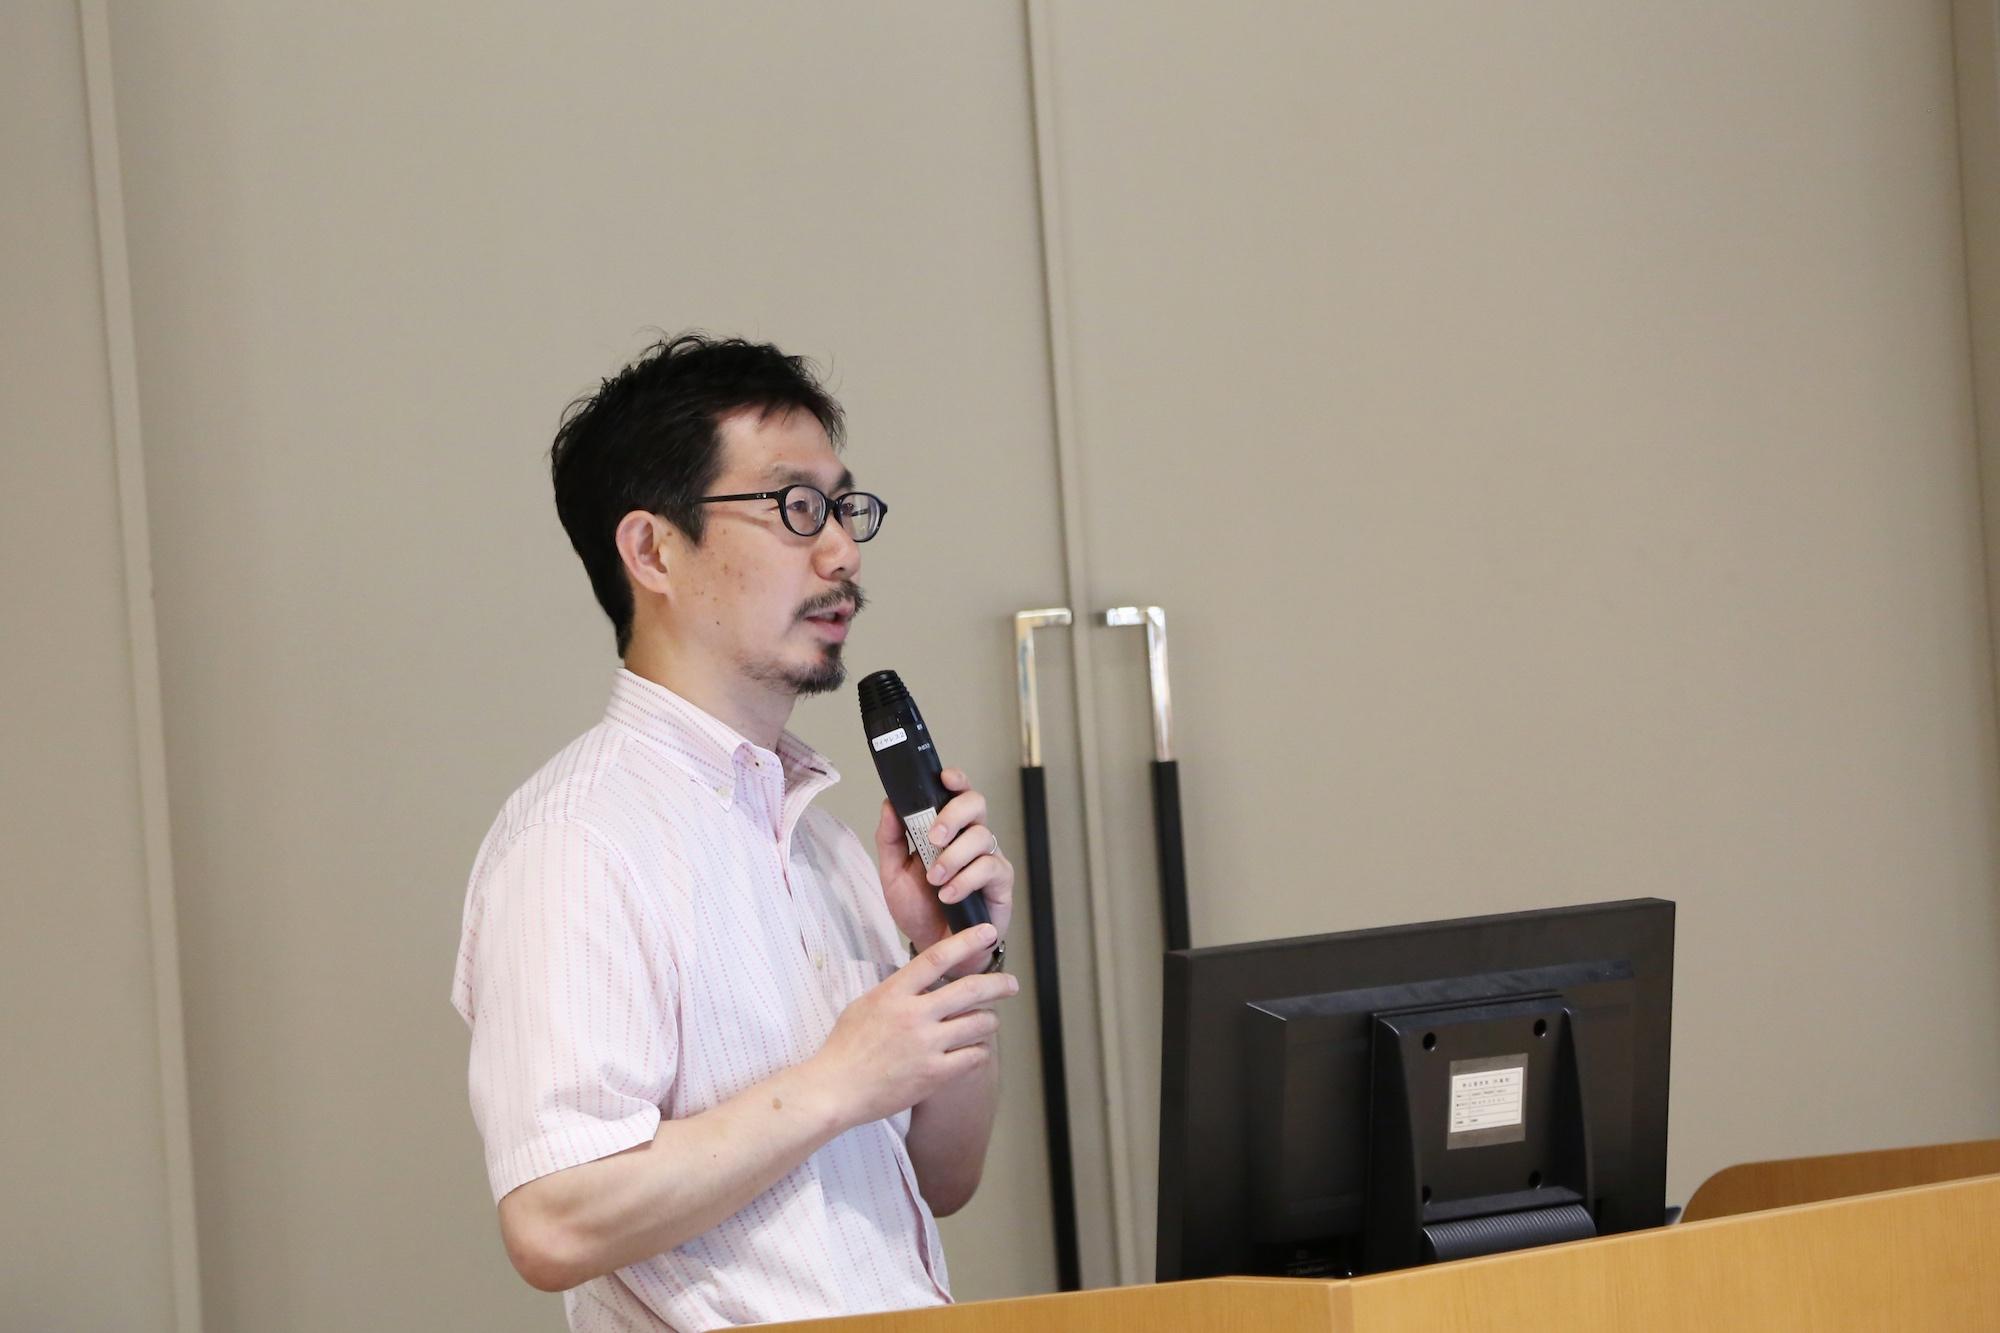 高倉浩樹(東北大学東北アジア研究センター教授) photo:當麻妙